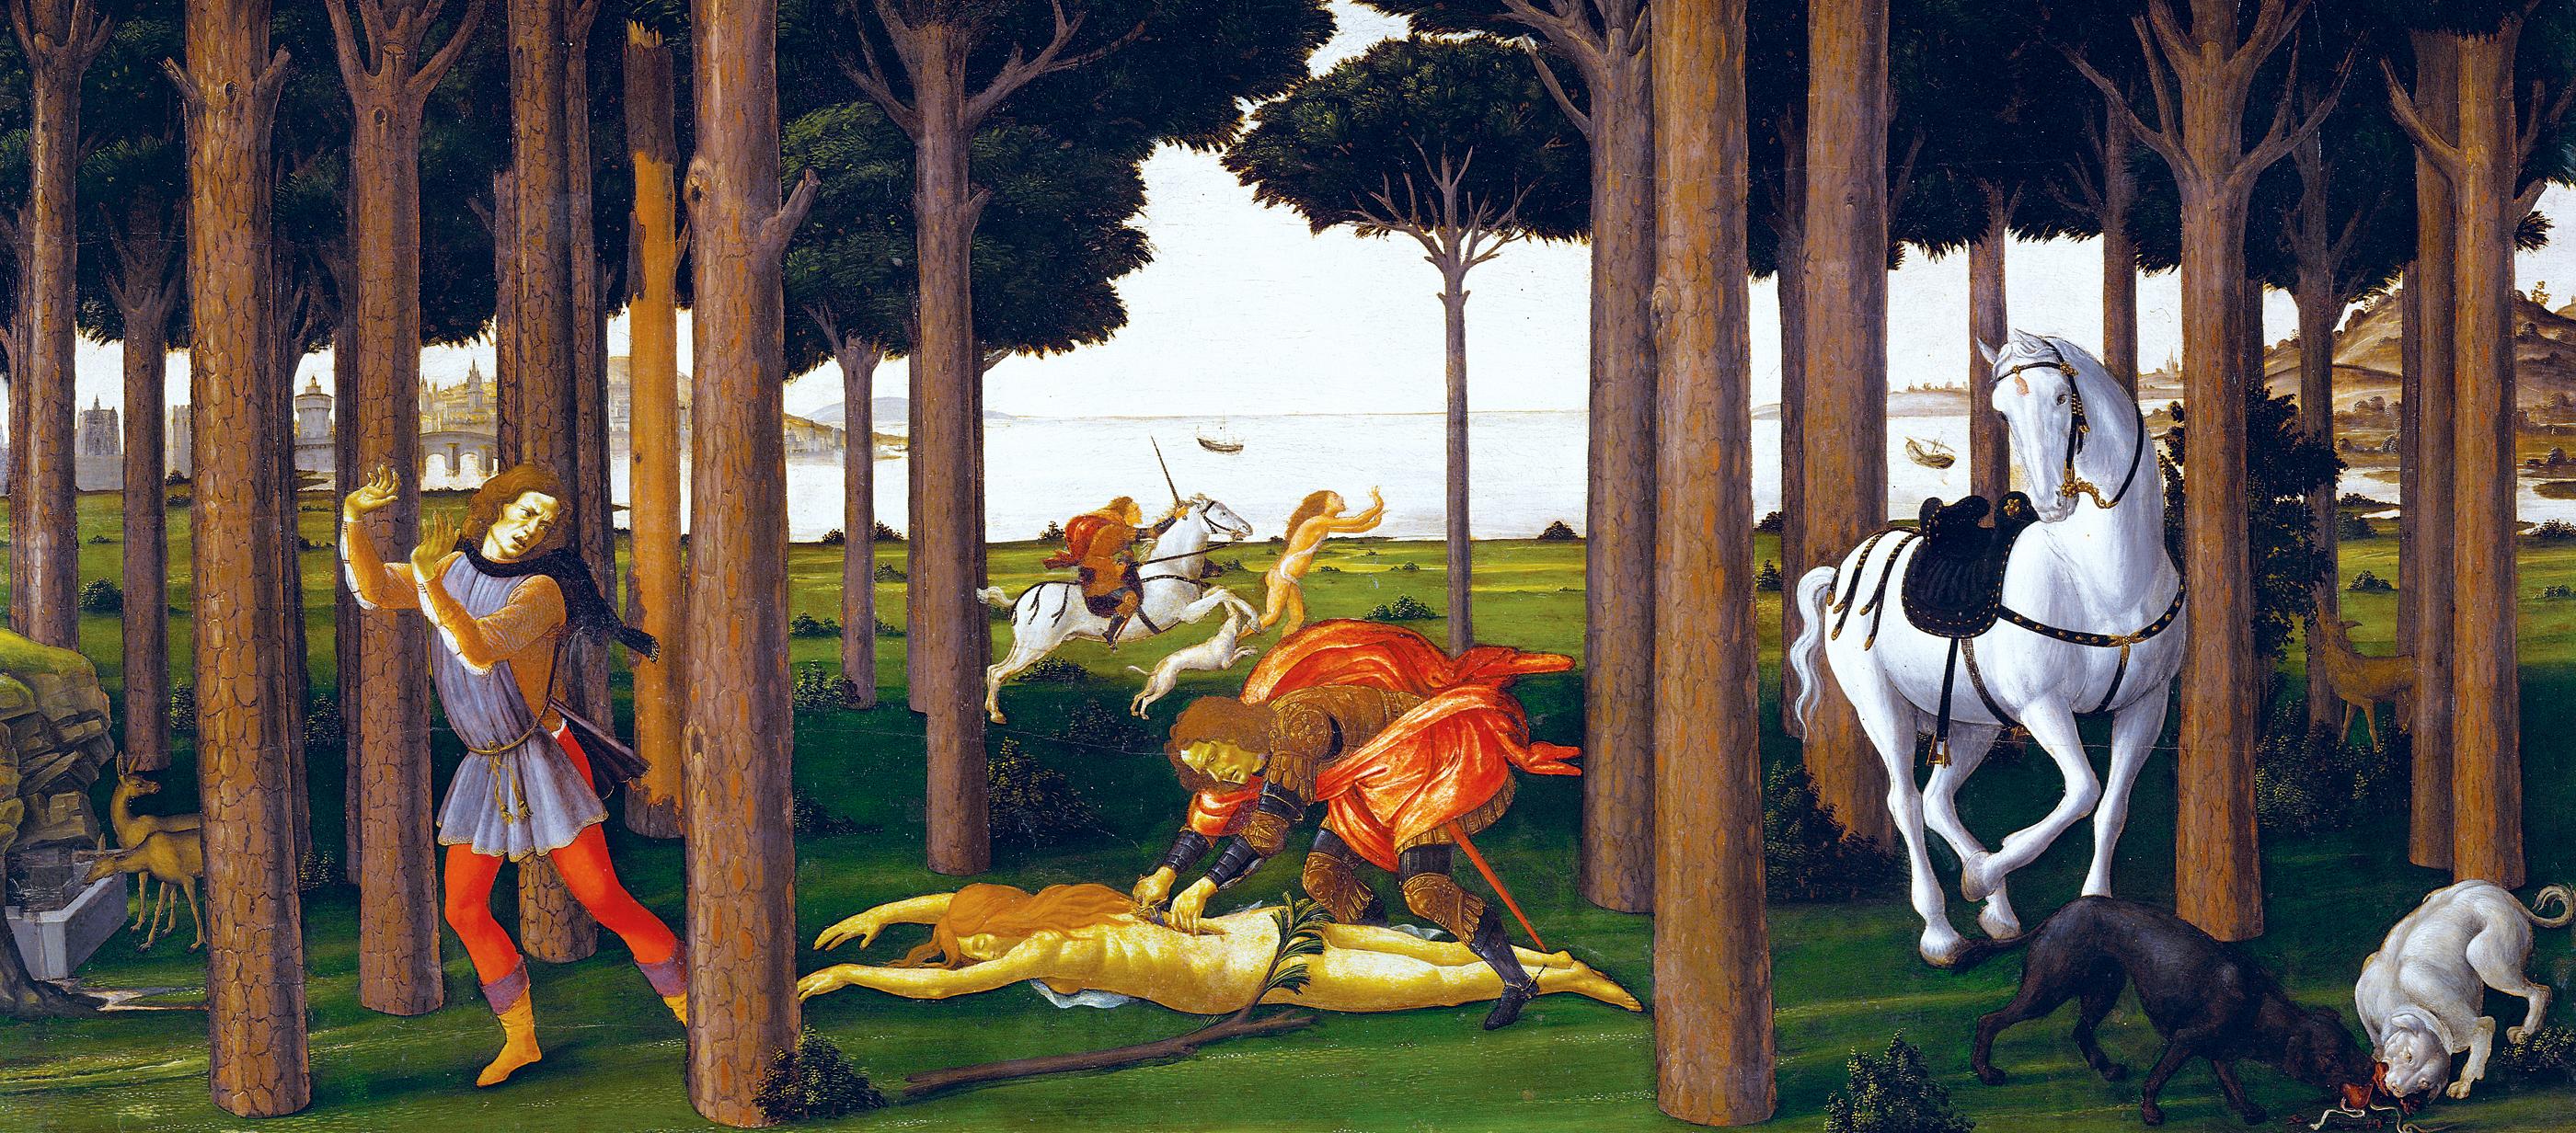 Story of Nastagio degli Onesti, second panel, by Sandro Botticelli, c.1483, based on Boccaccio's Decameron. Prado Museum, Madrid, Spain.